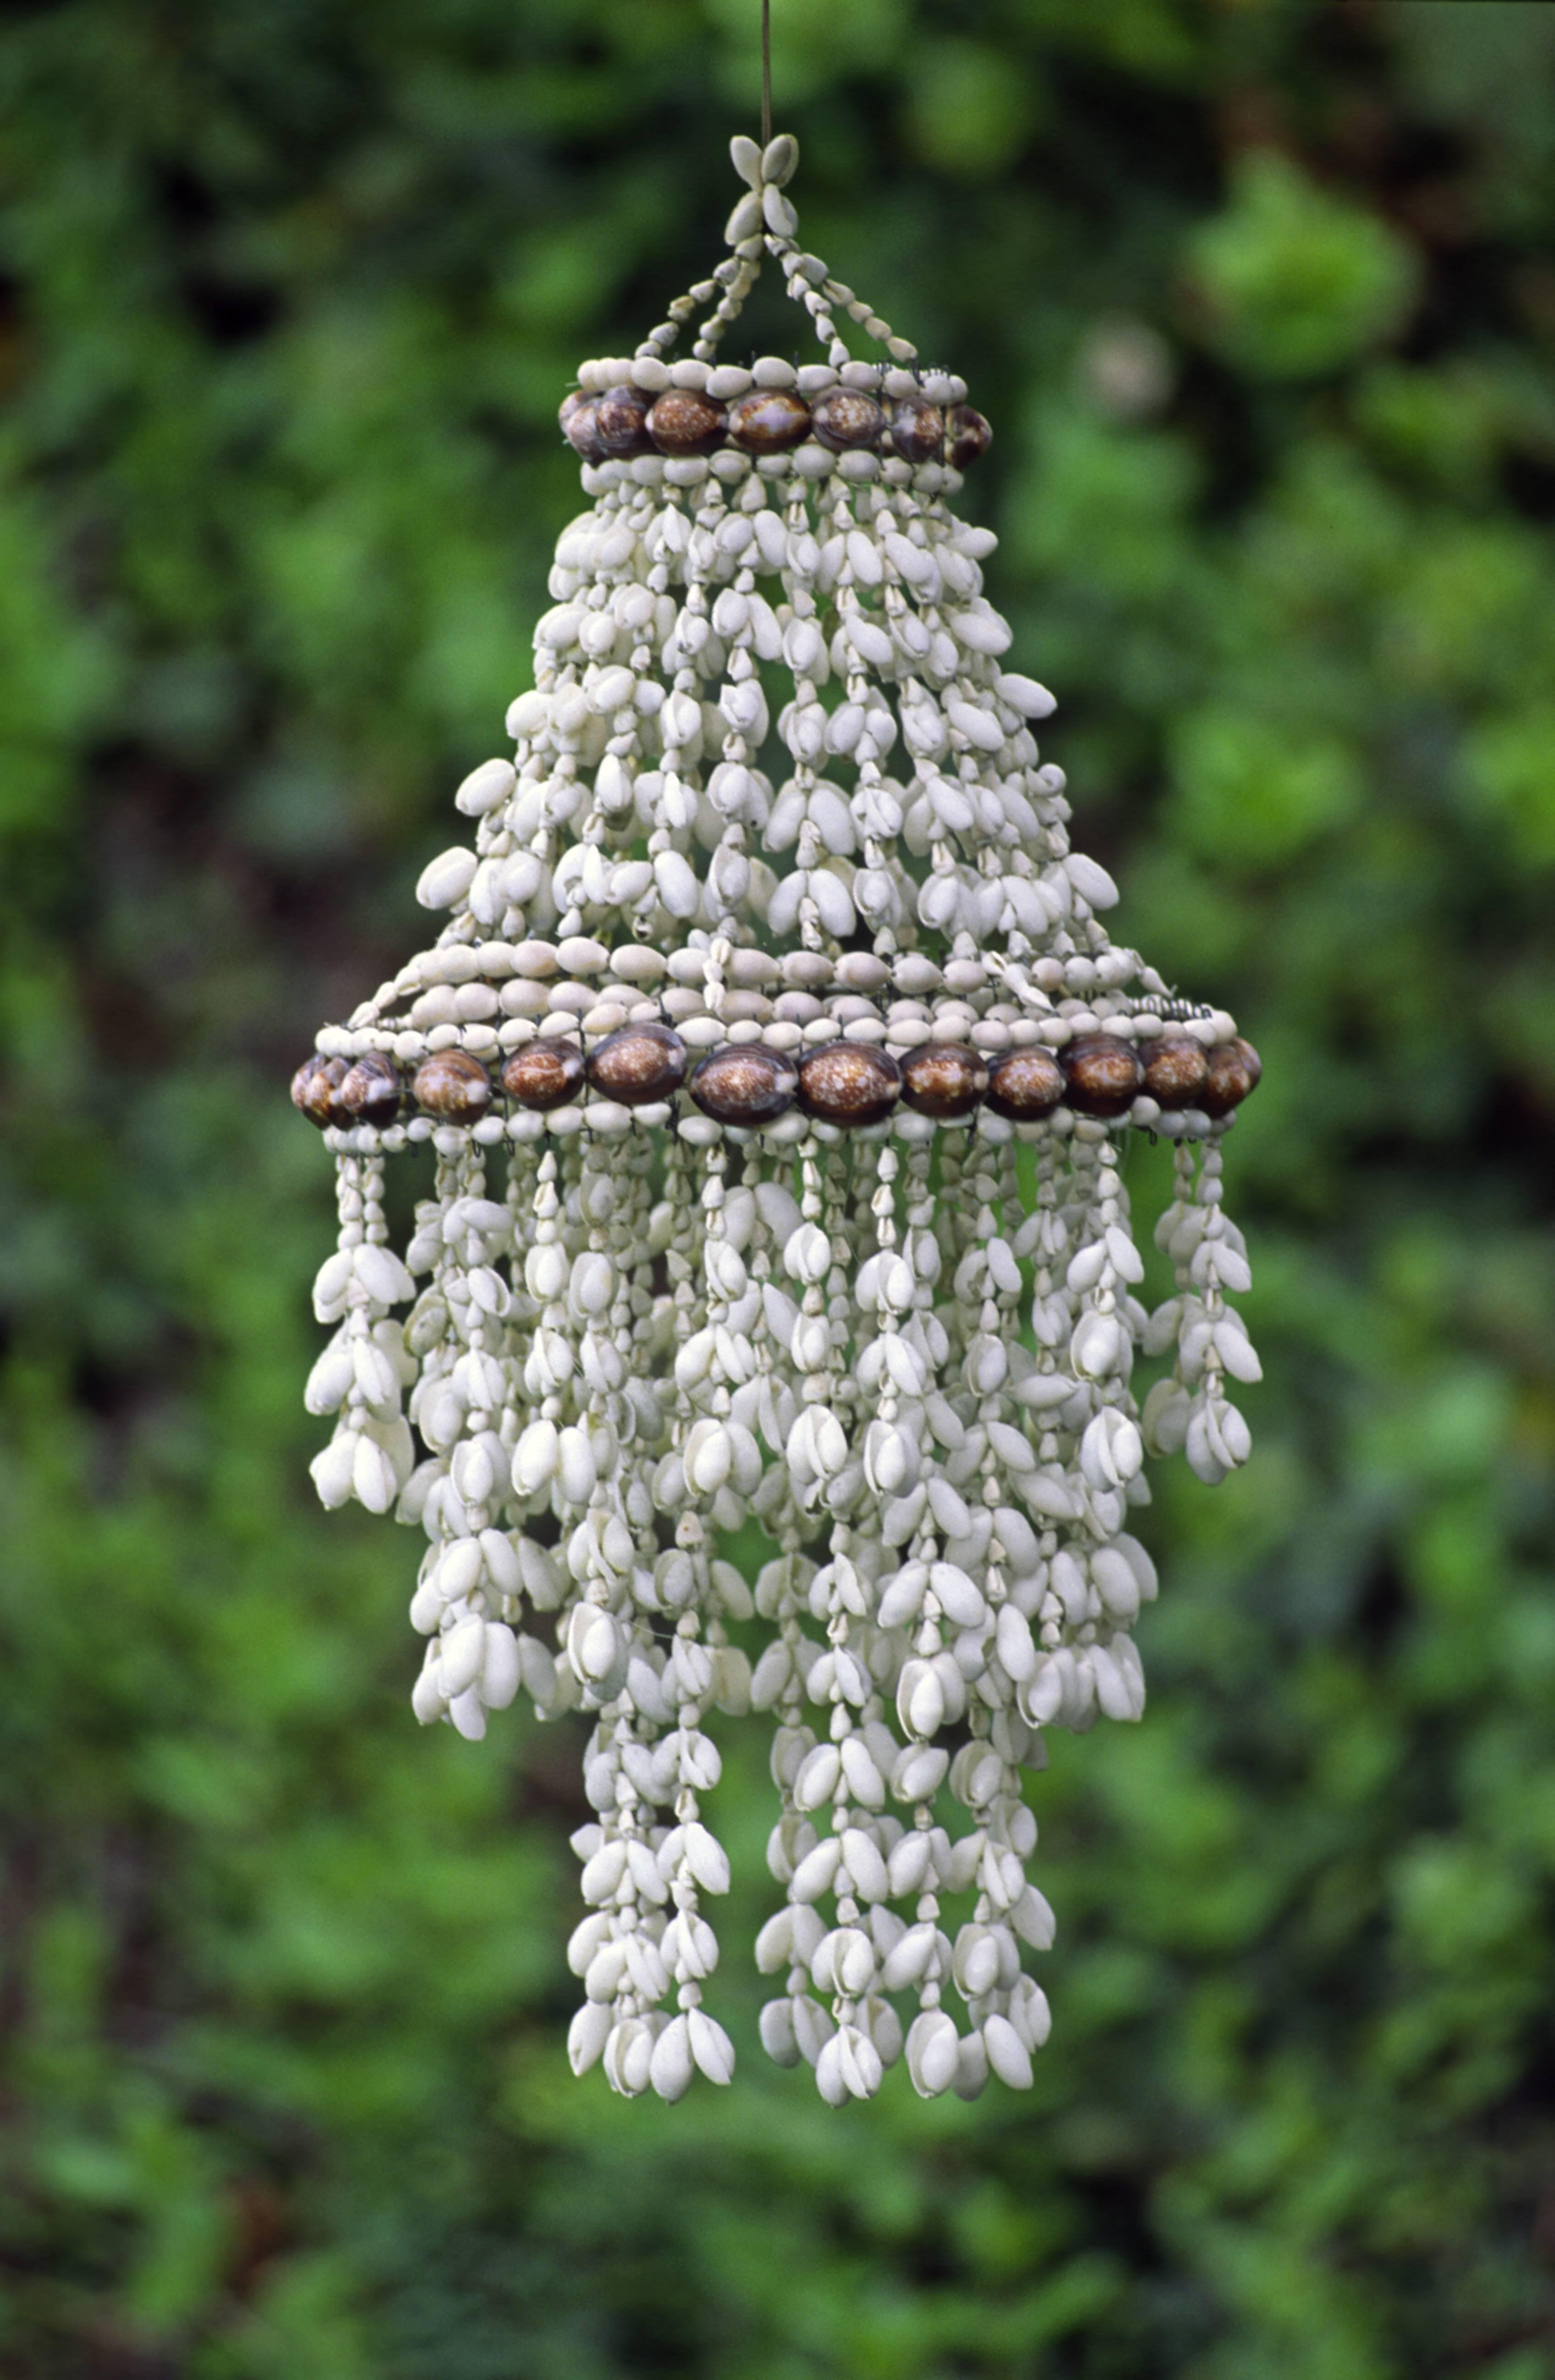 Windspiel basteln aus Naturmaterialien: 3 tolle Ideen